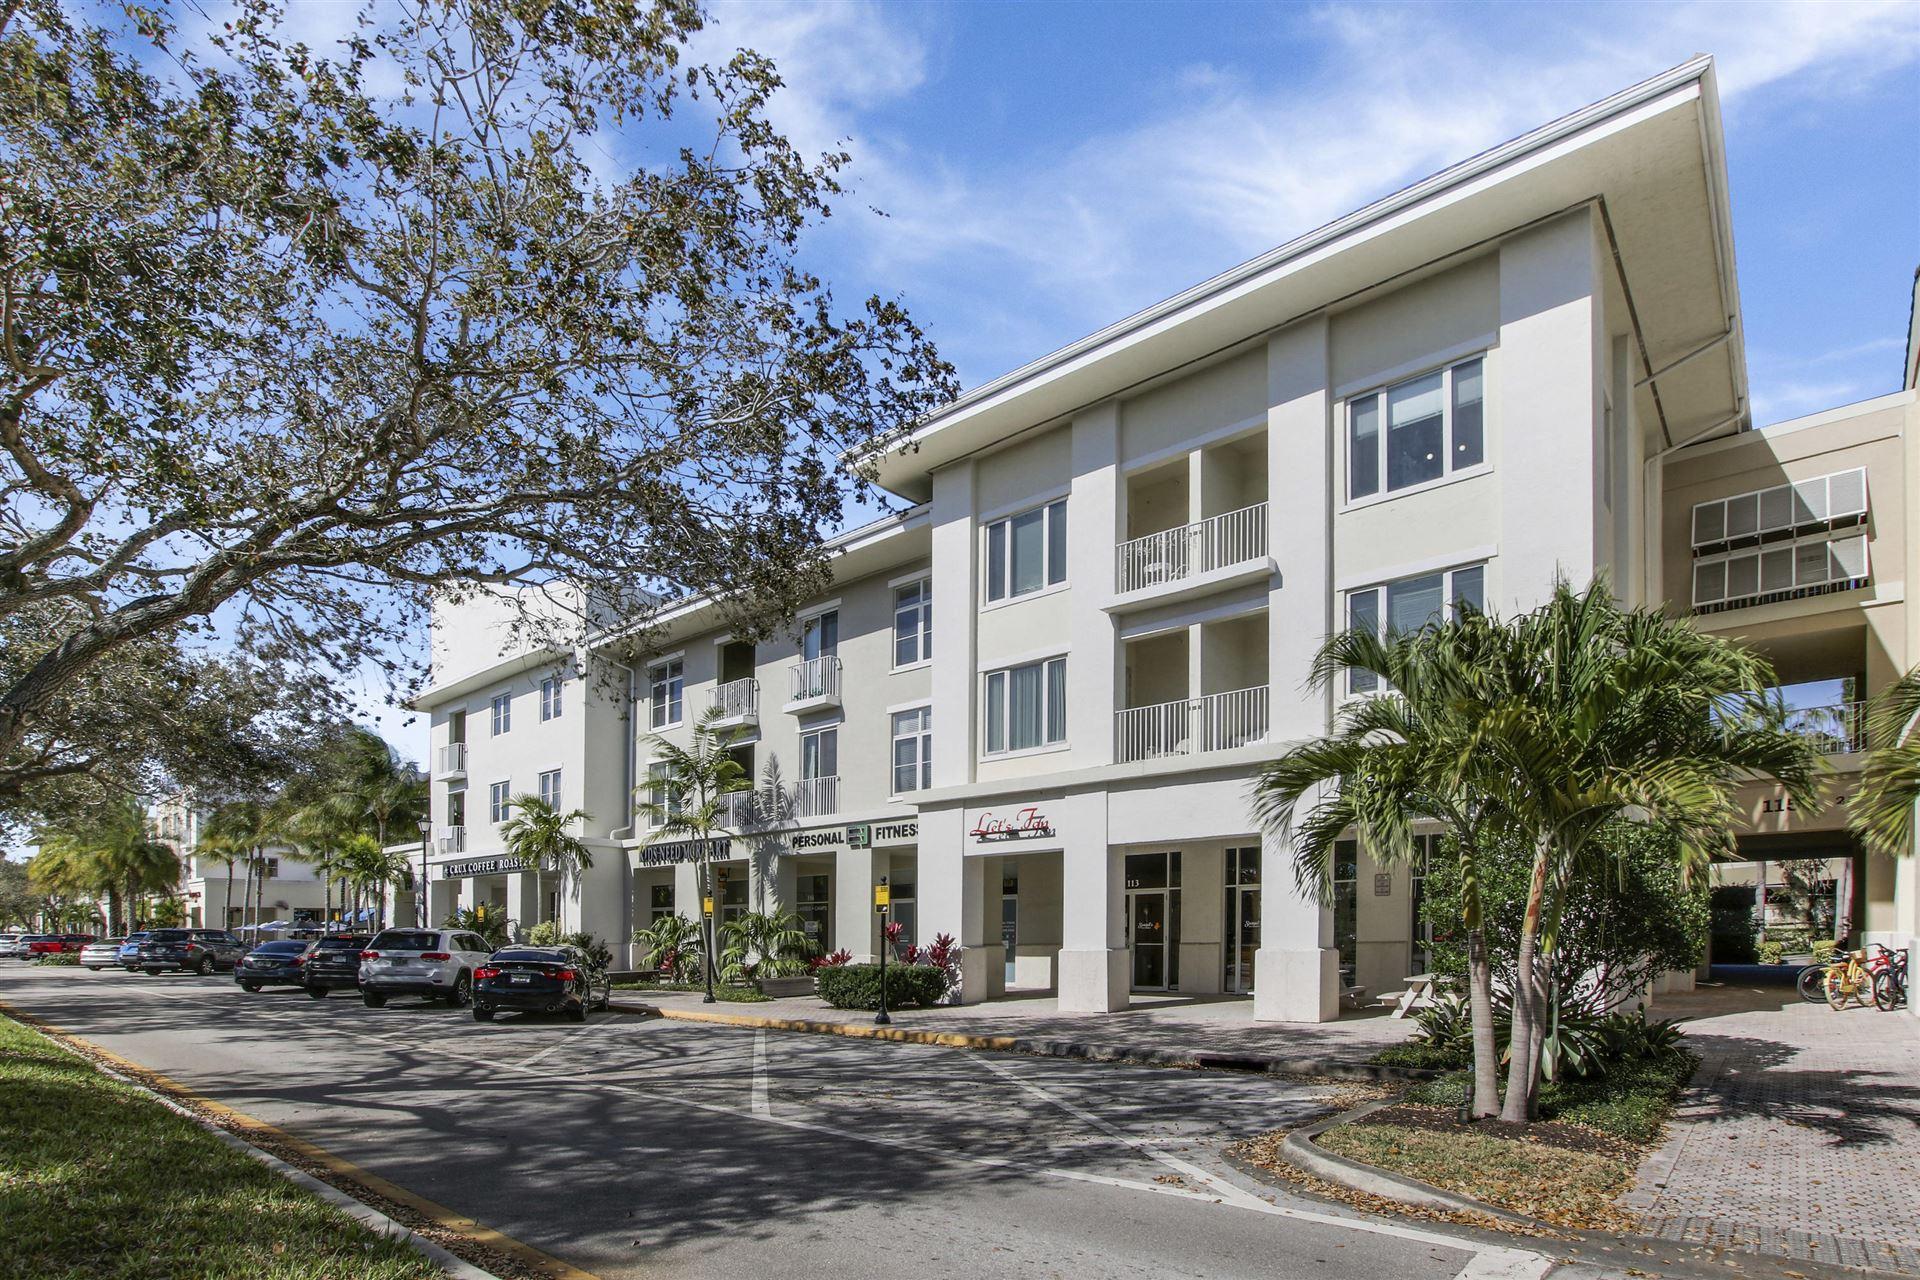 Photo of 1155 Main Street #214, Jupiter, FL 33458 (MLS # RX-10695265)